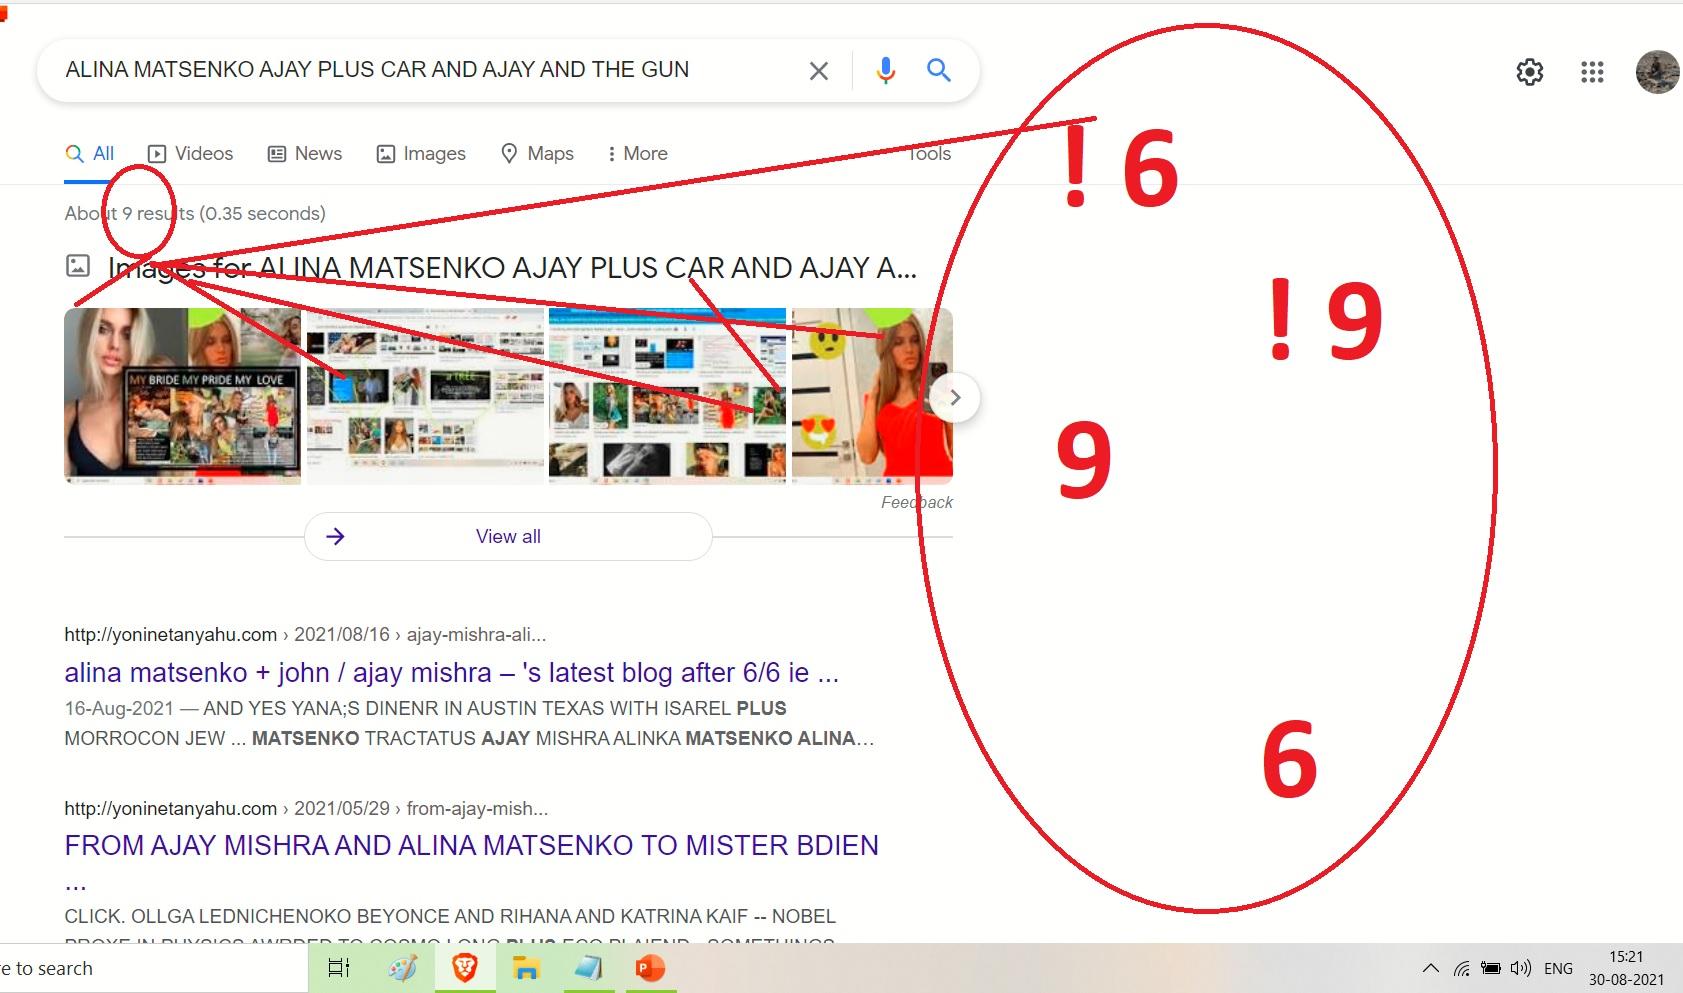 ALINA MATSENKO AJAY PLUS CAR AND AJAY AND THE GUN